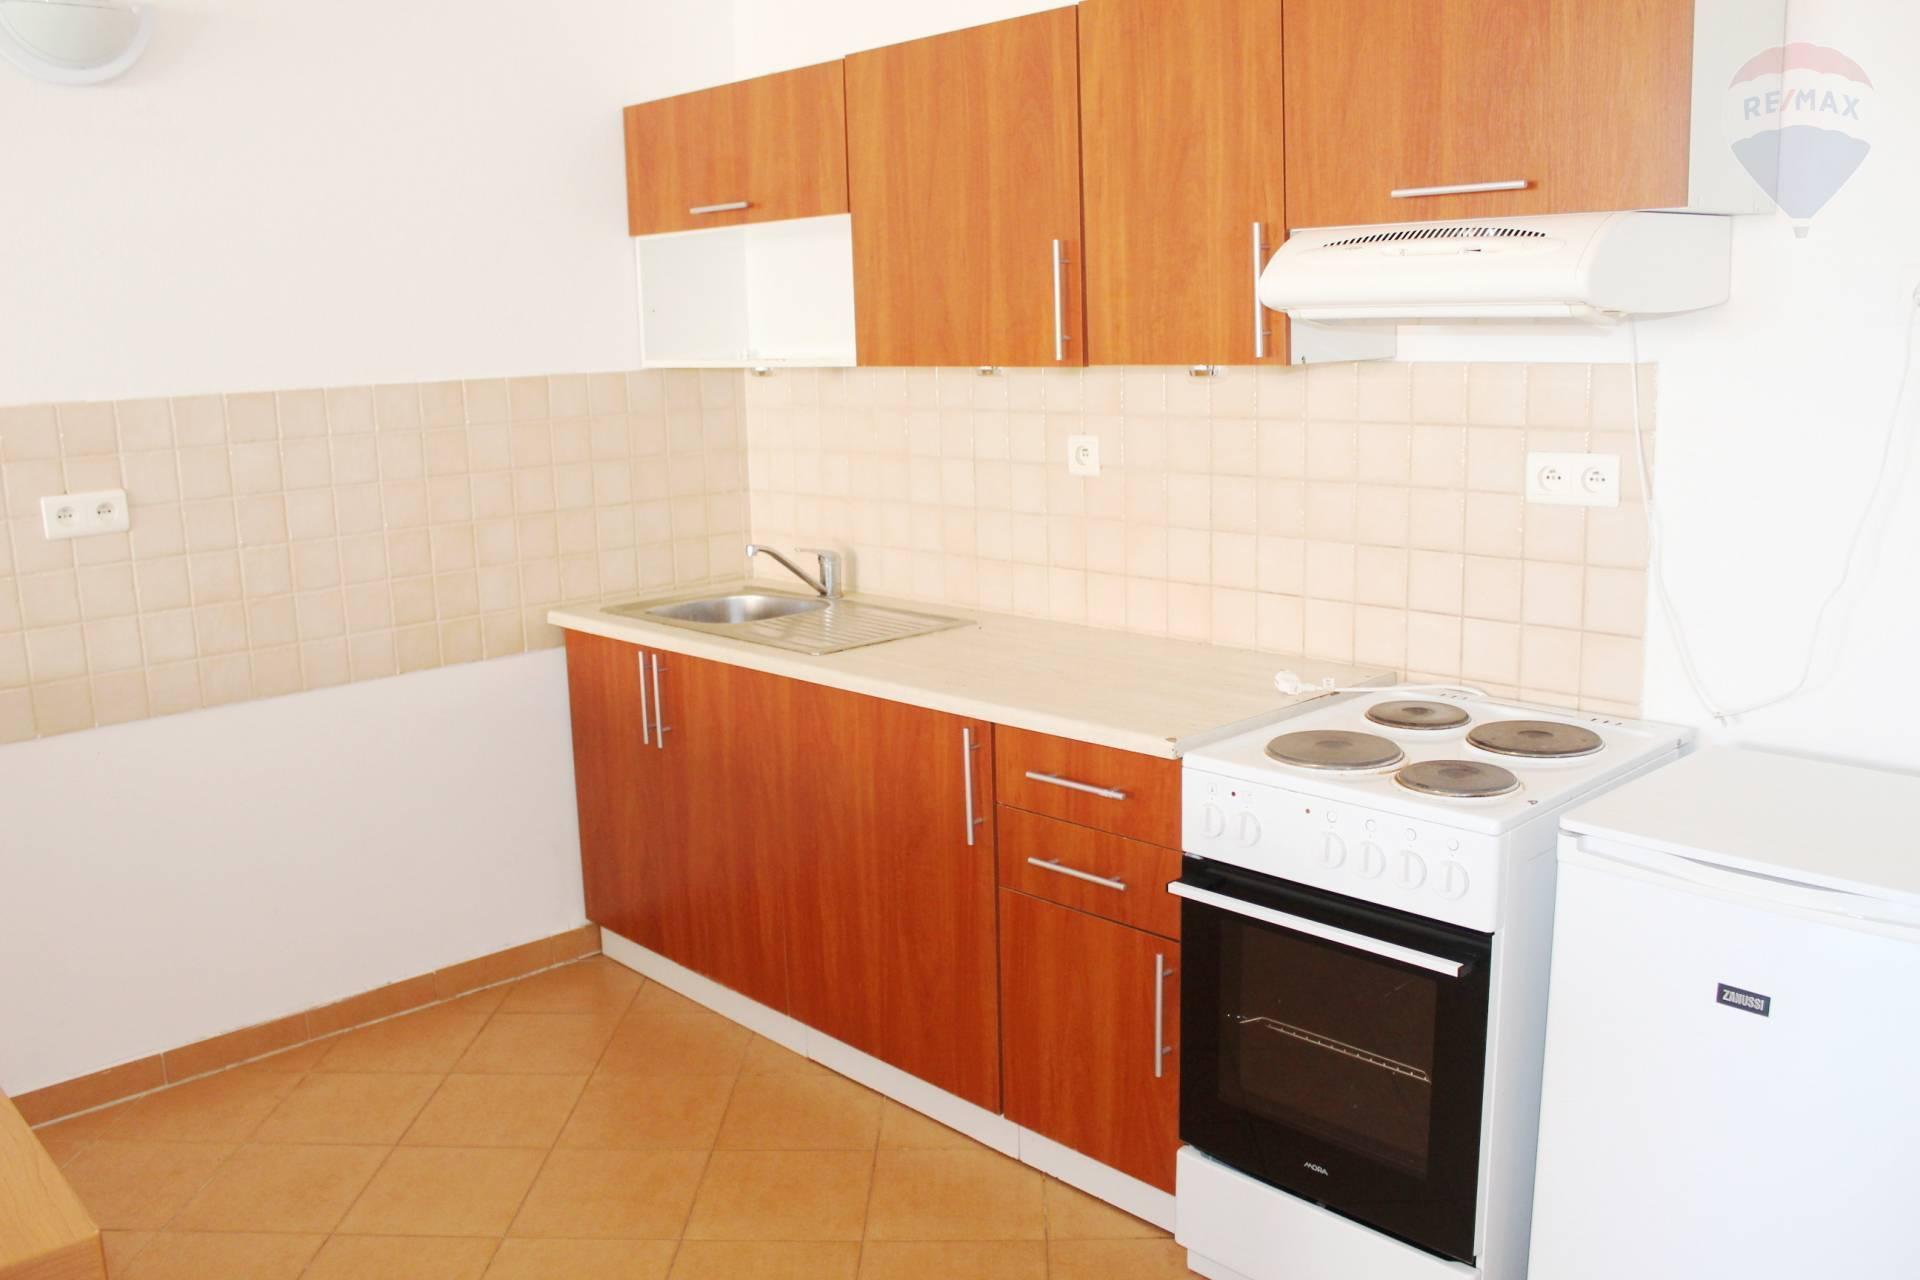 Predaj bytu (2 izbový) 76 m2, Bratislava - Ružinov -